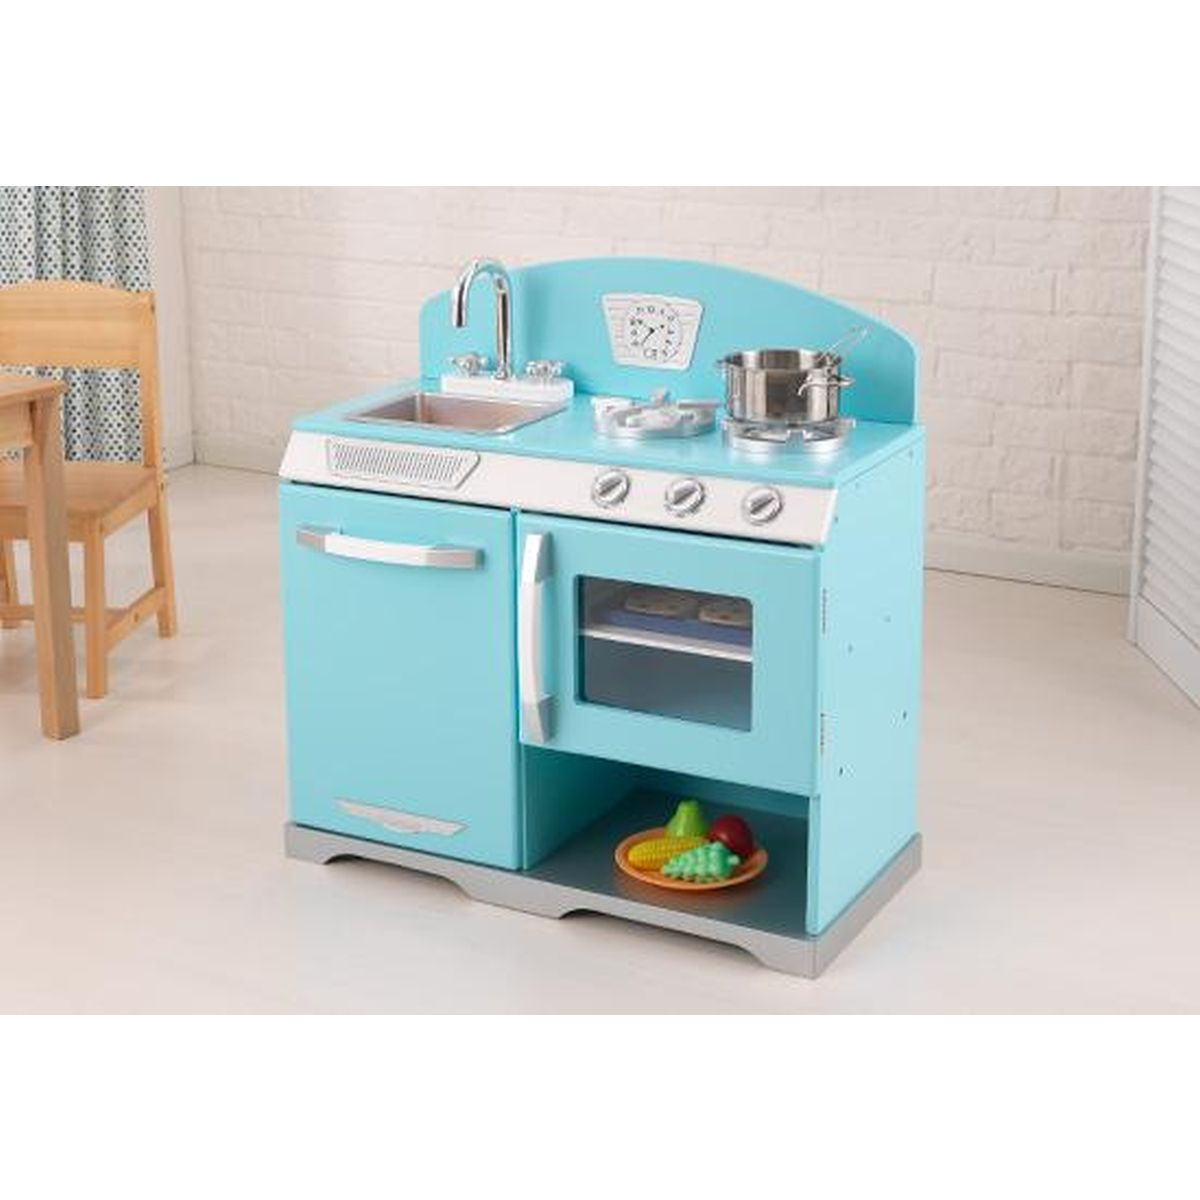 Kidkraft Cuisine Enfant Rechaud Bleu Retro 53252 Acandi Vente